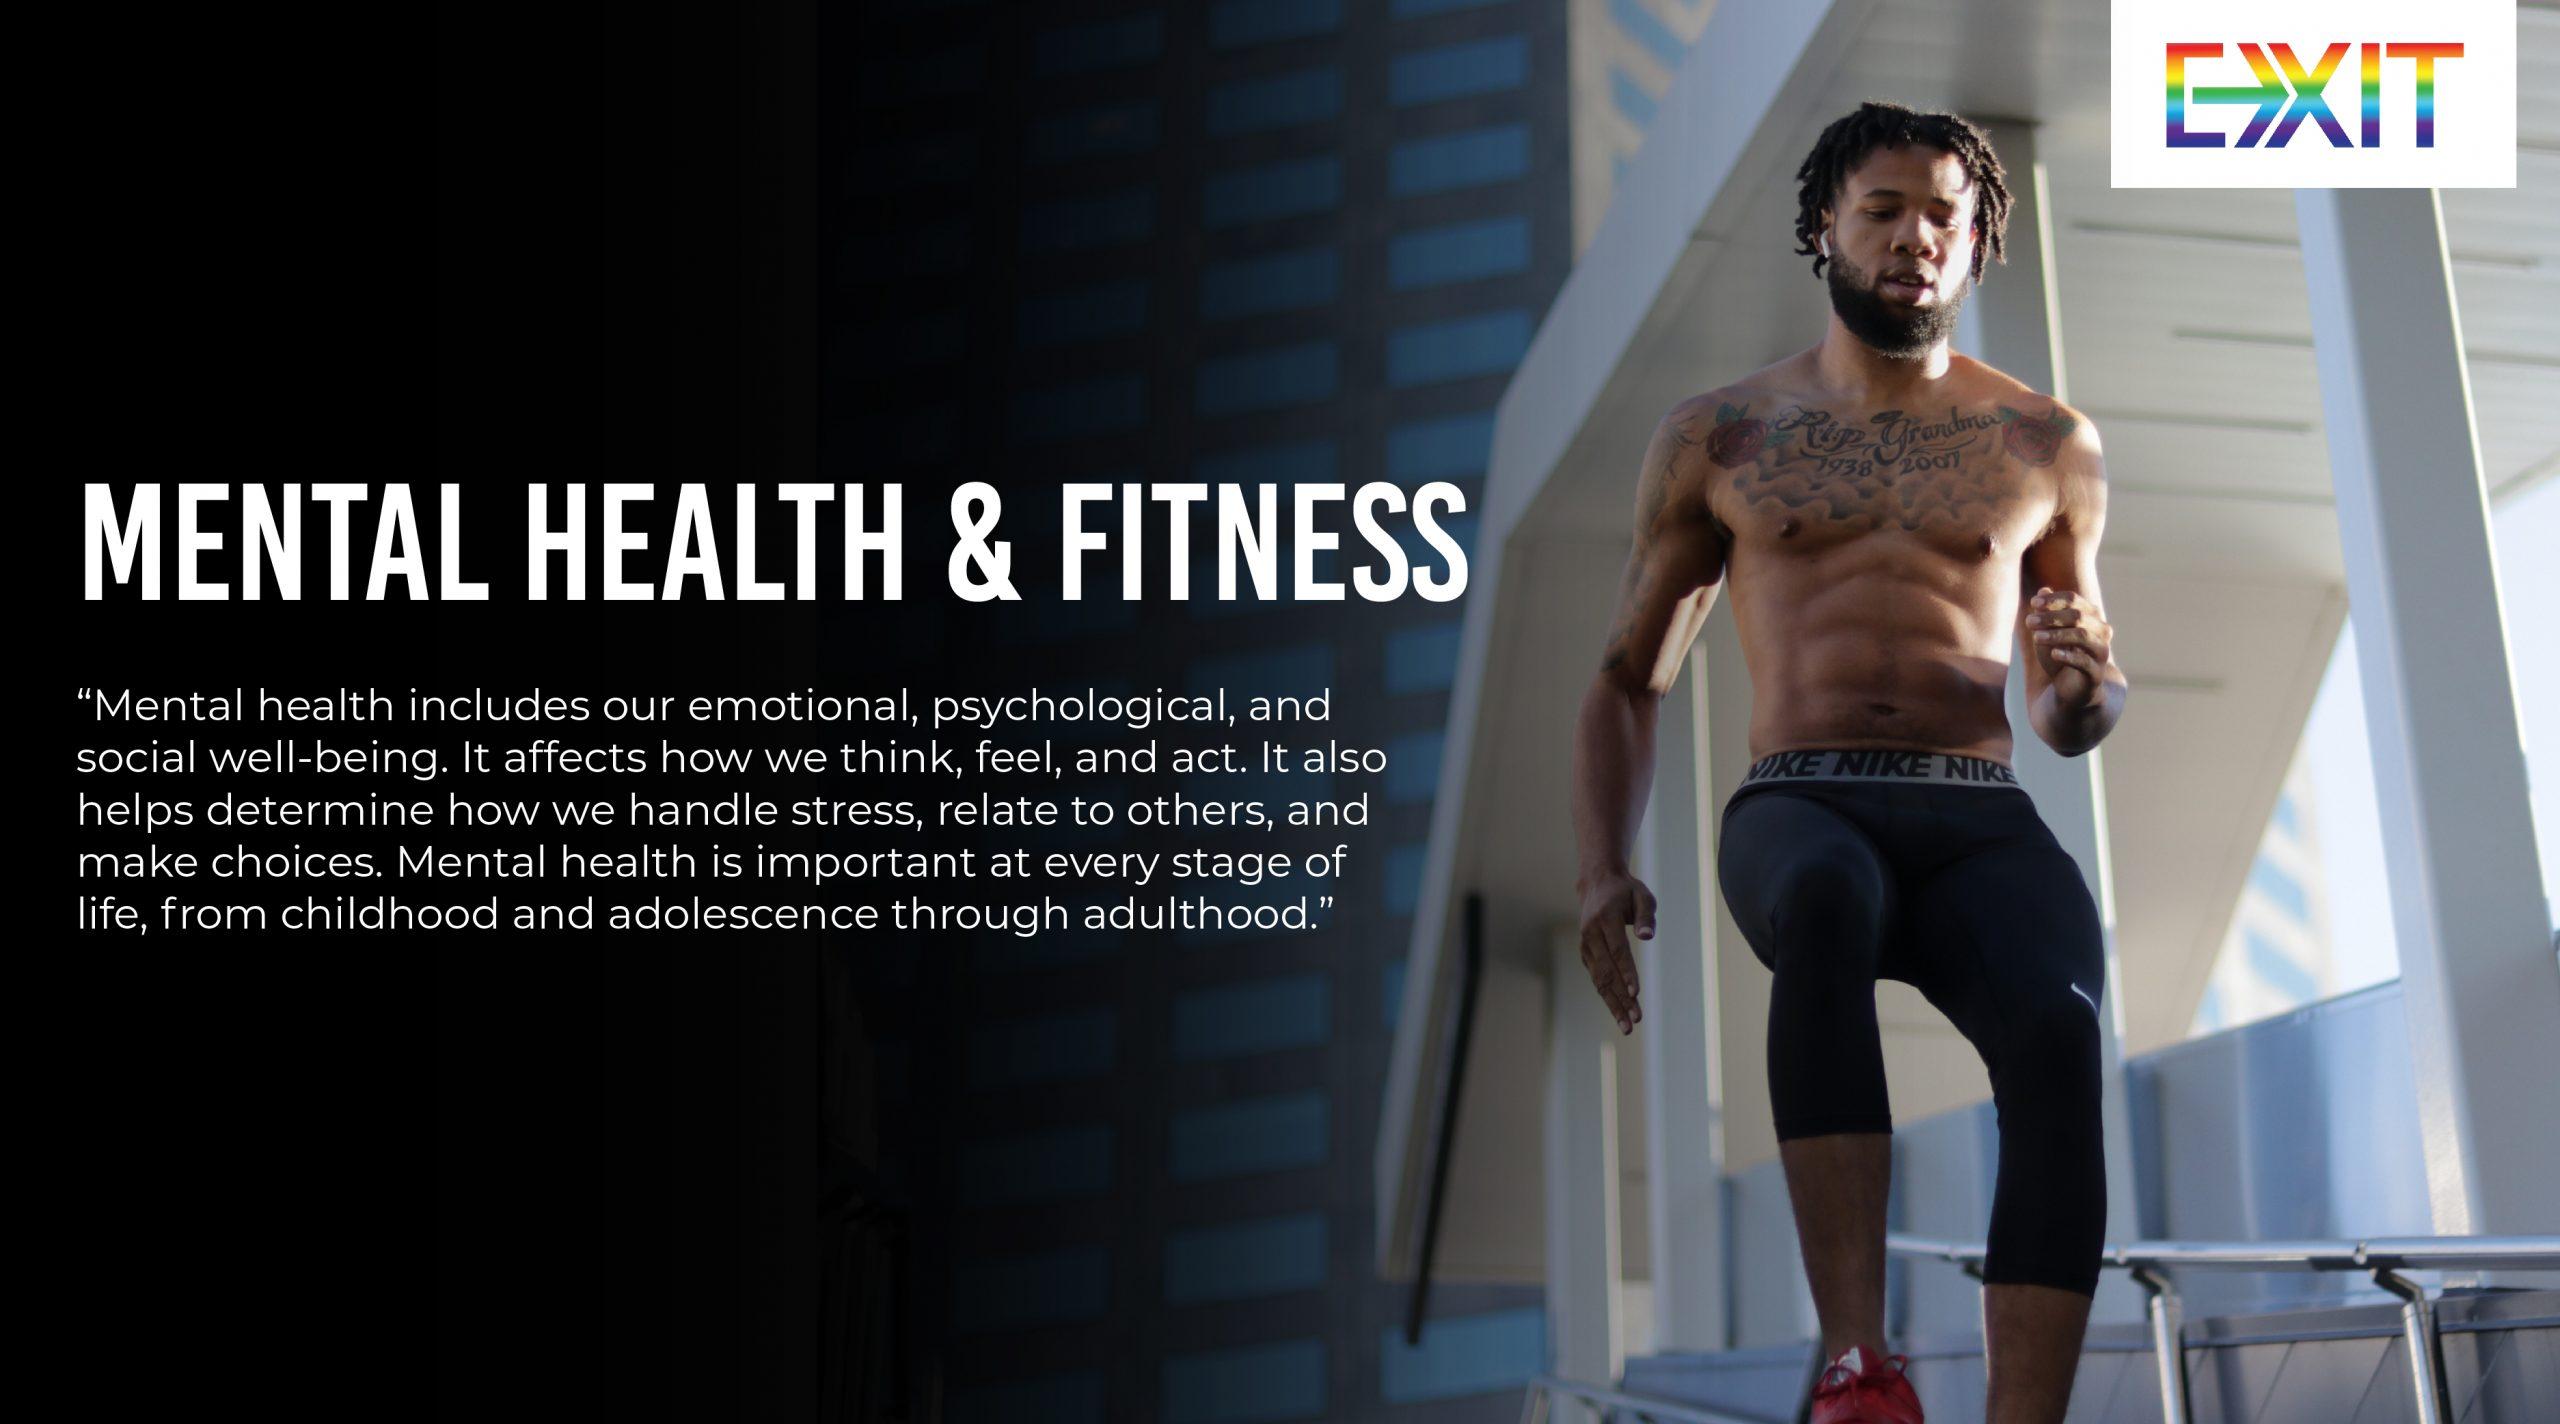 MENTAL HEALTH & FITNESS